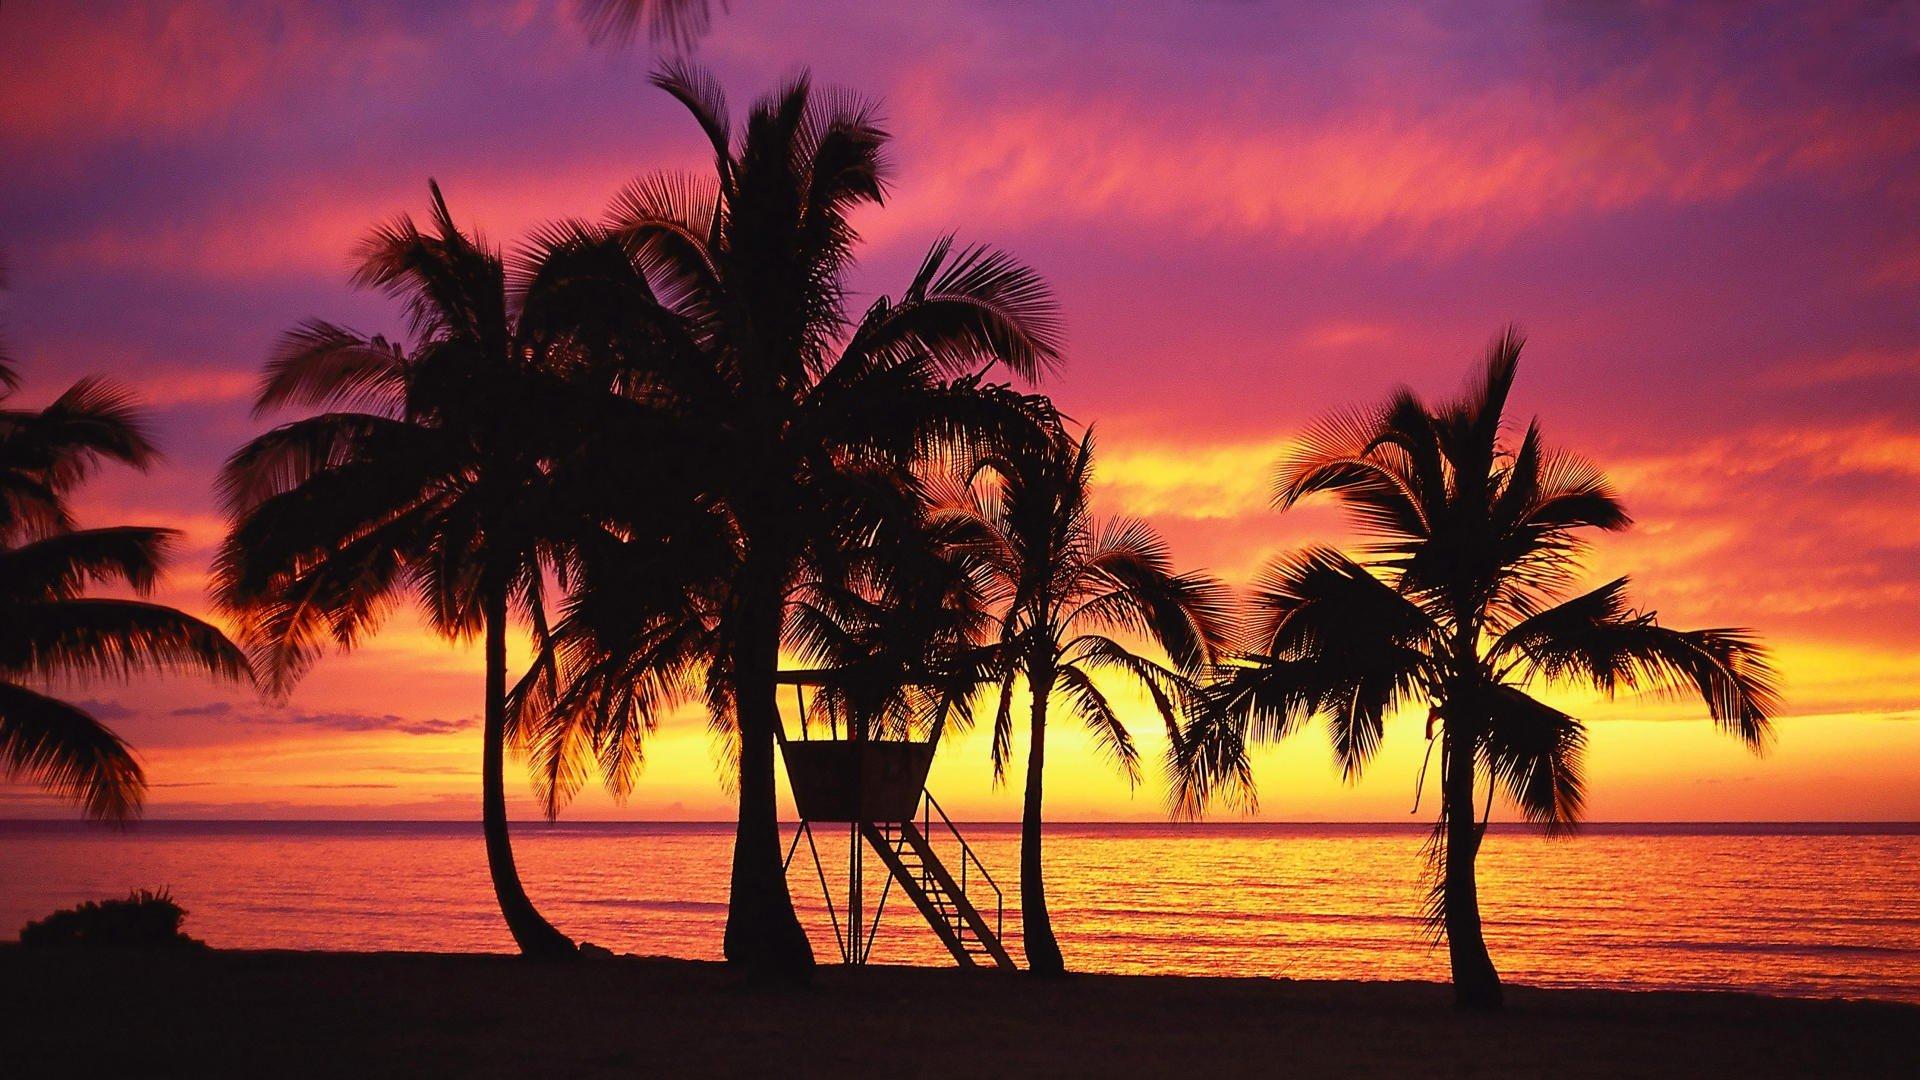 Hawaiian Beach Wallpapers Wallpaper - Palm Trees - HD Wallpaper